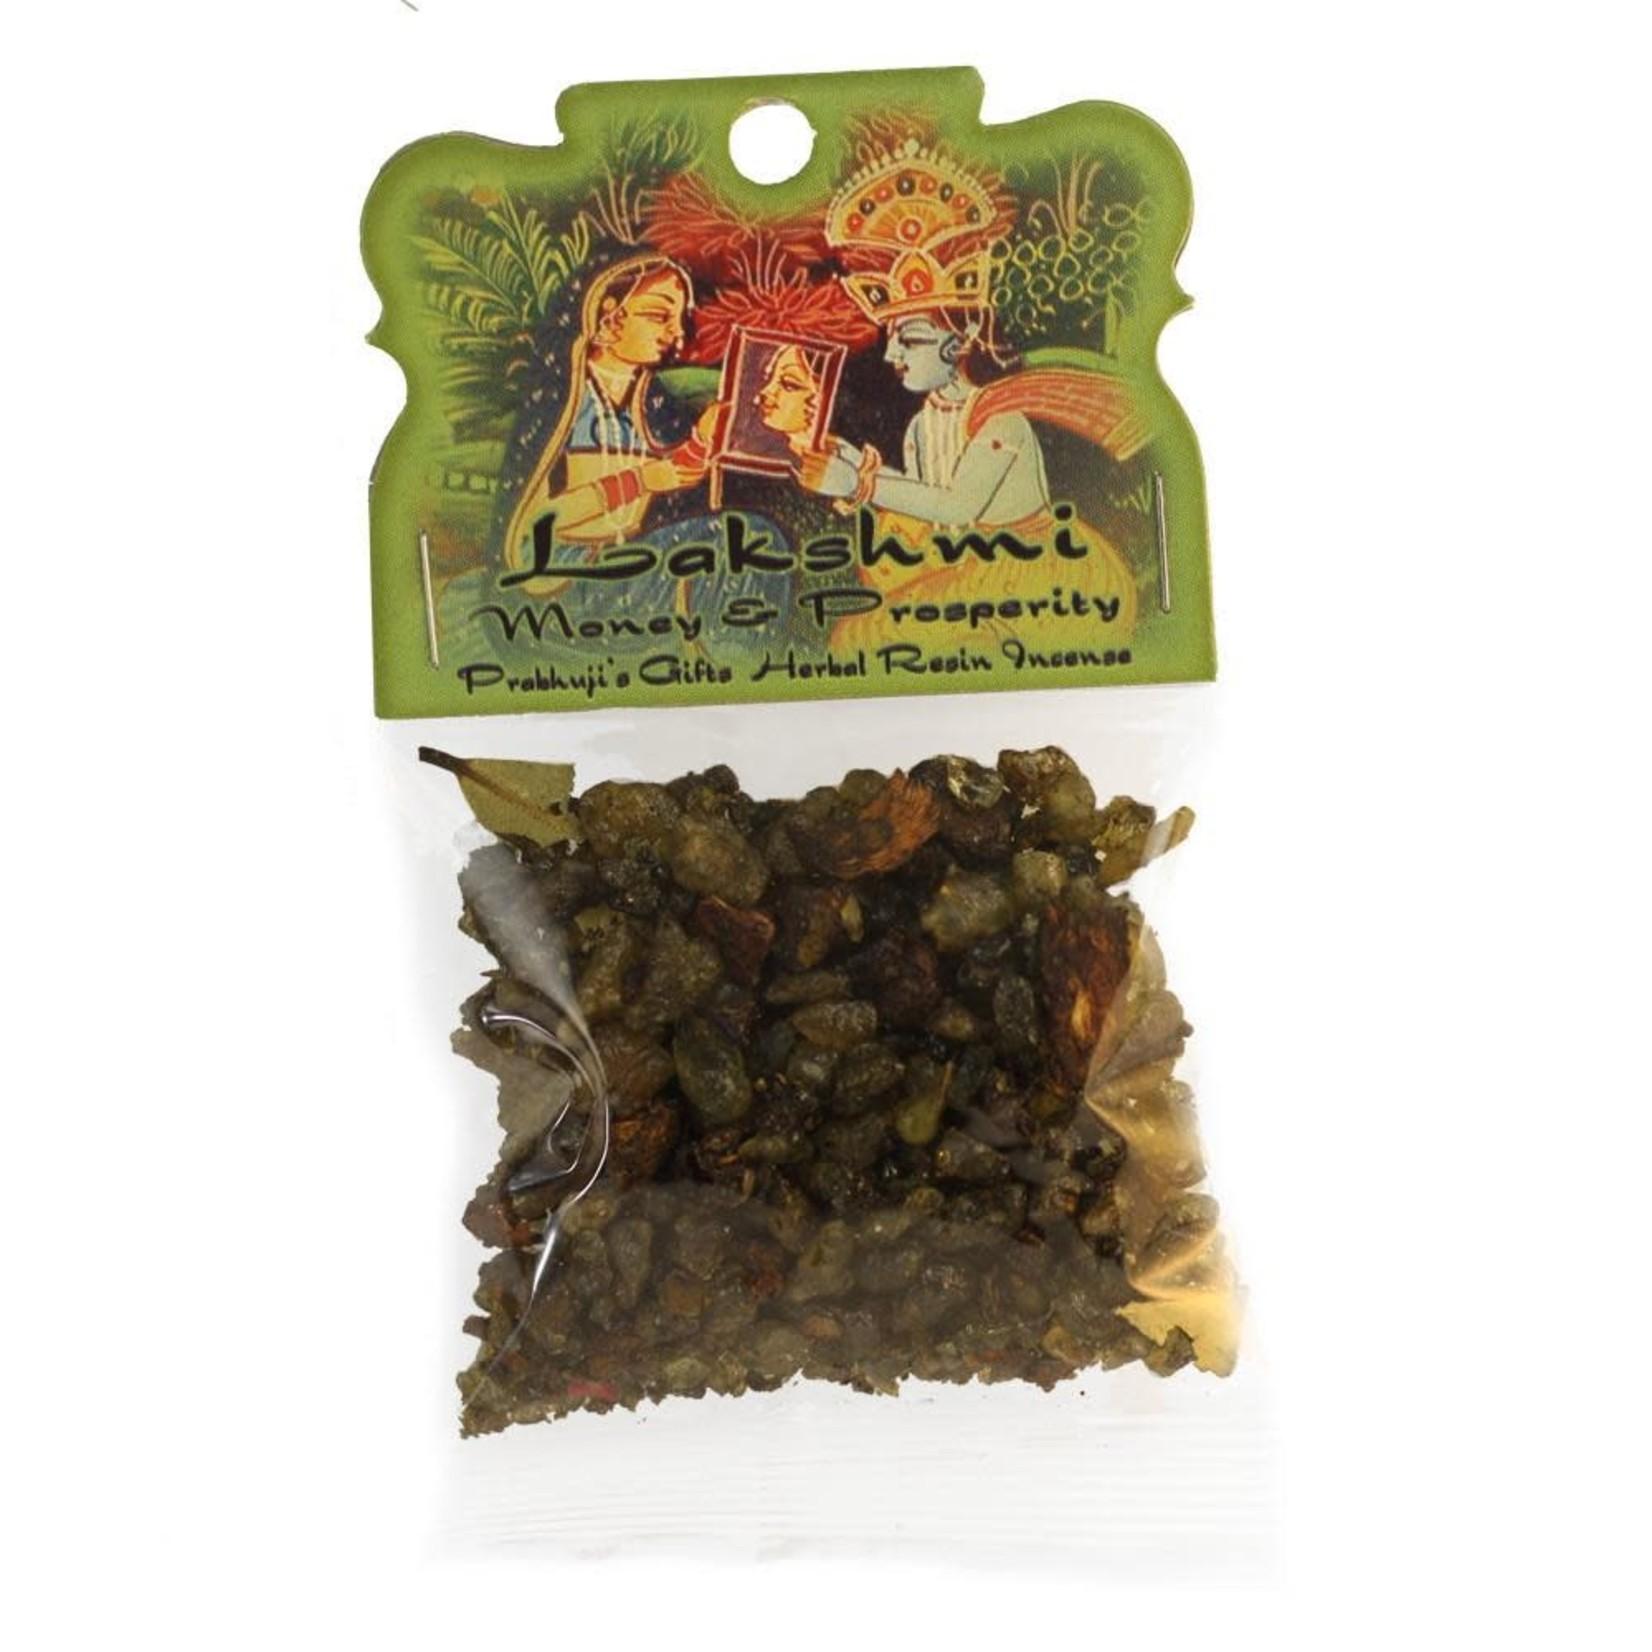 Prabhujis Gifts Lakshmi - Money and Prosperity Resin Incense